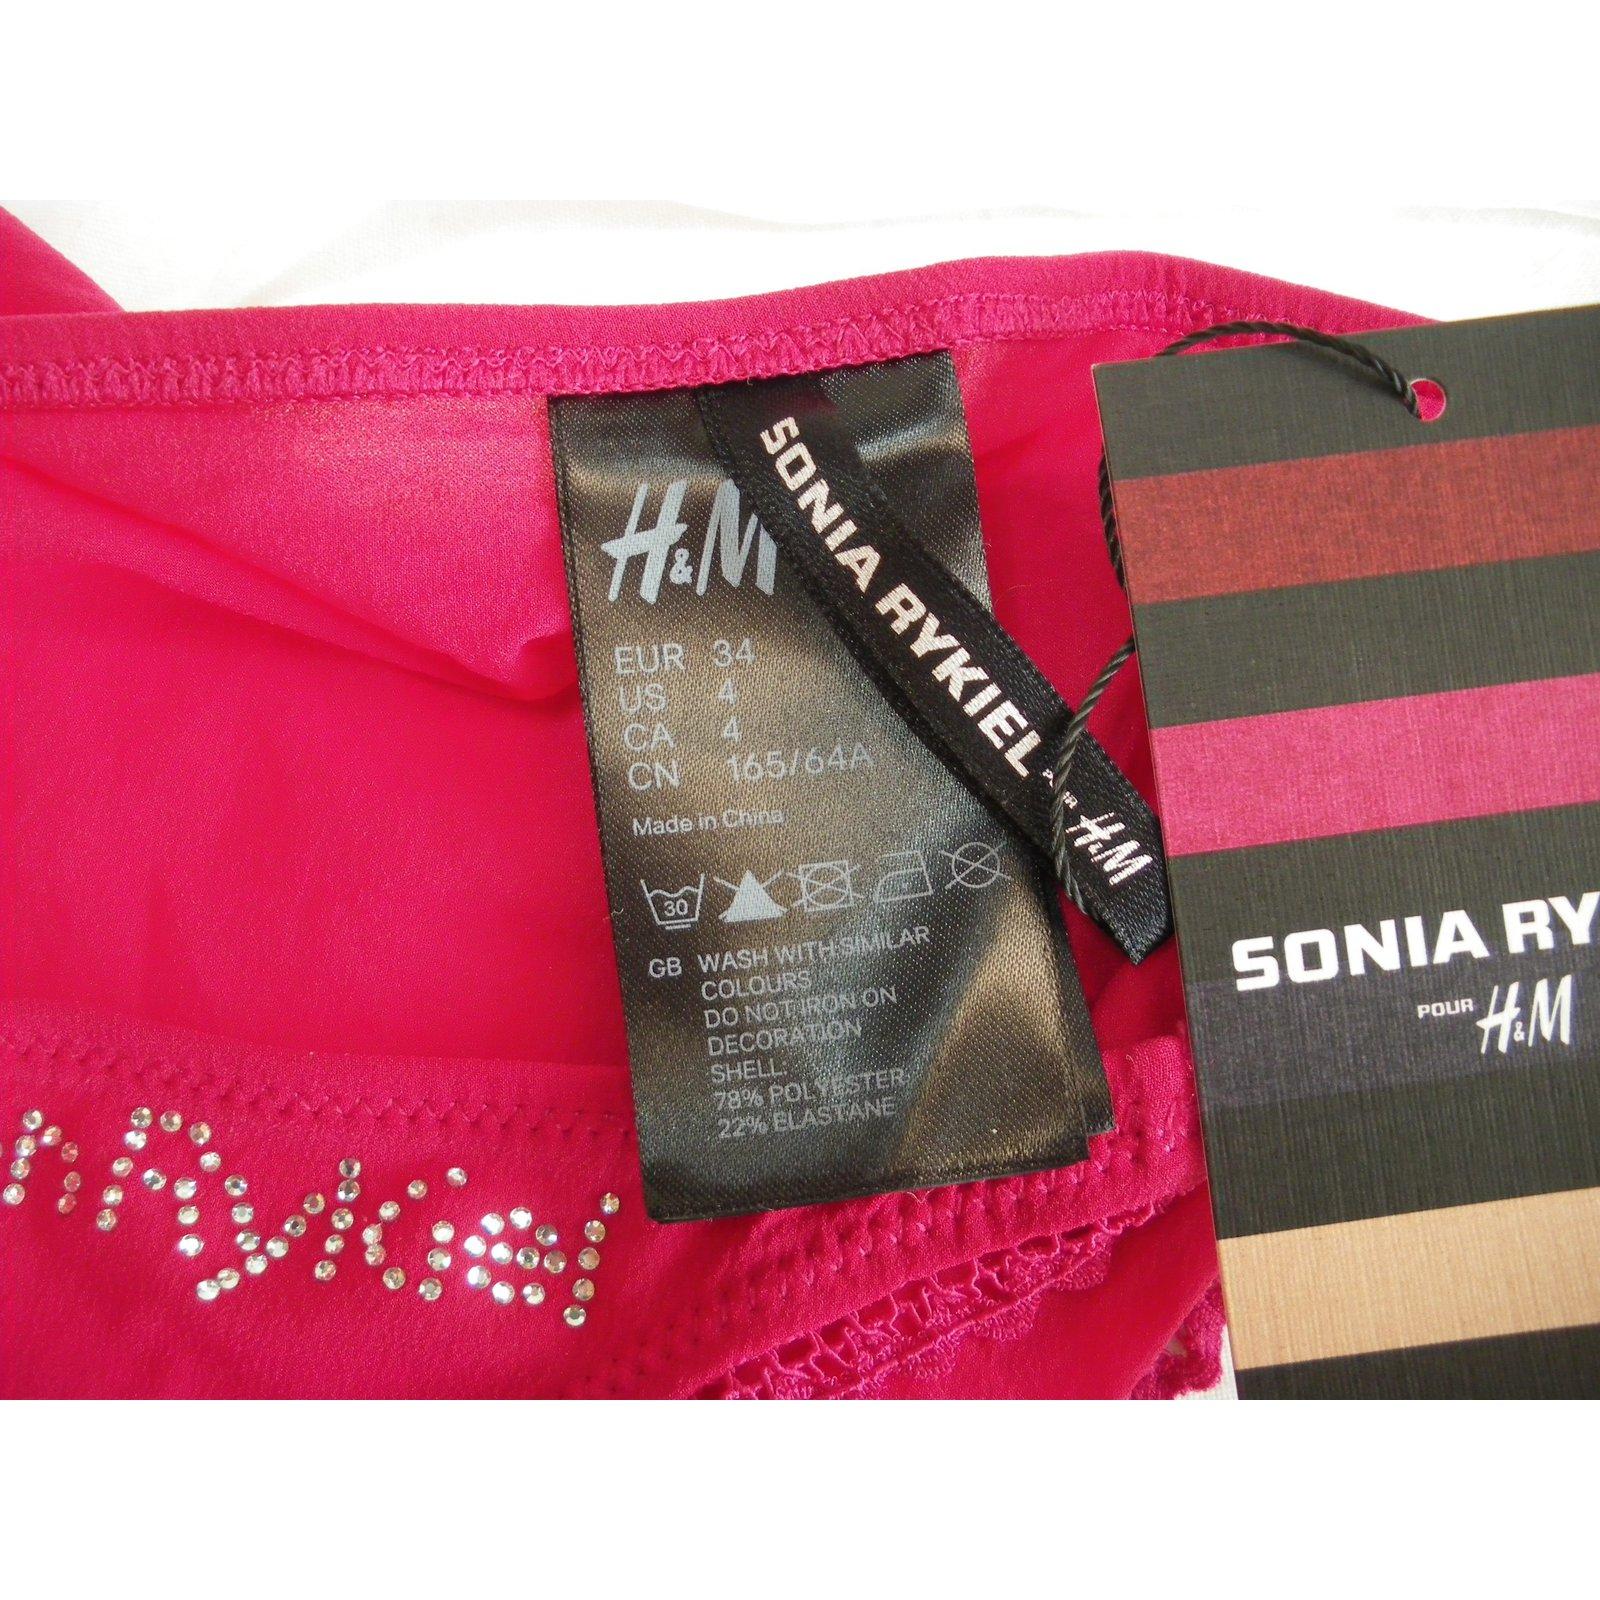 add19f005a2 Sonia Rykiel pour H&M Intimates Intimates Polyester Multiple colors  ref.76189 - Joli Closet